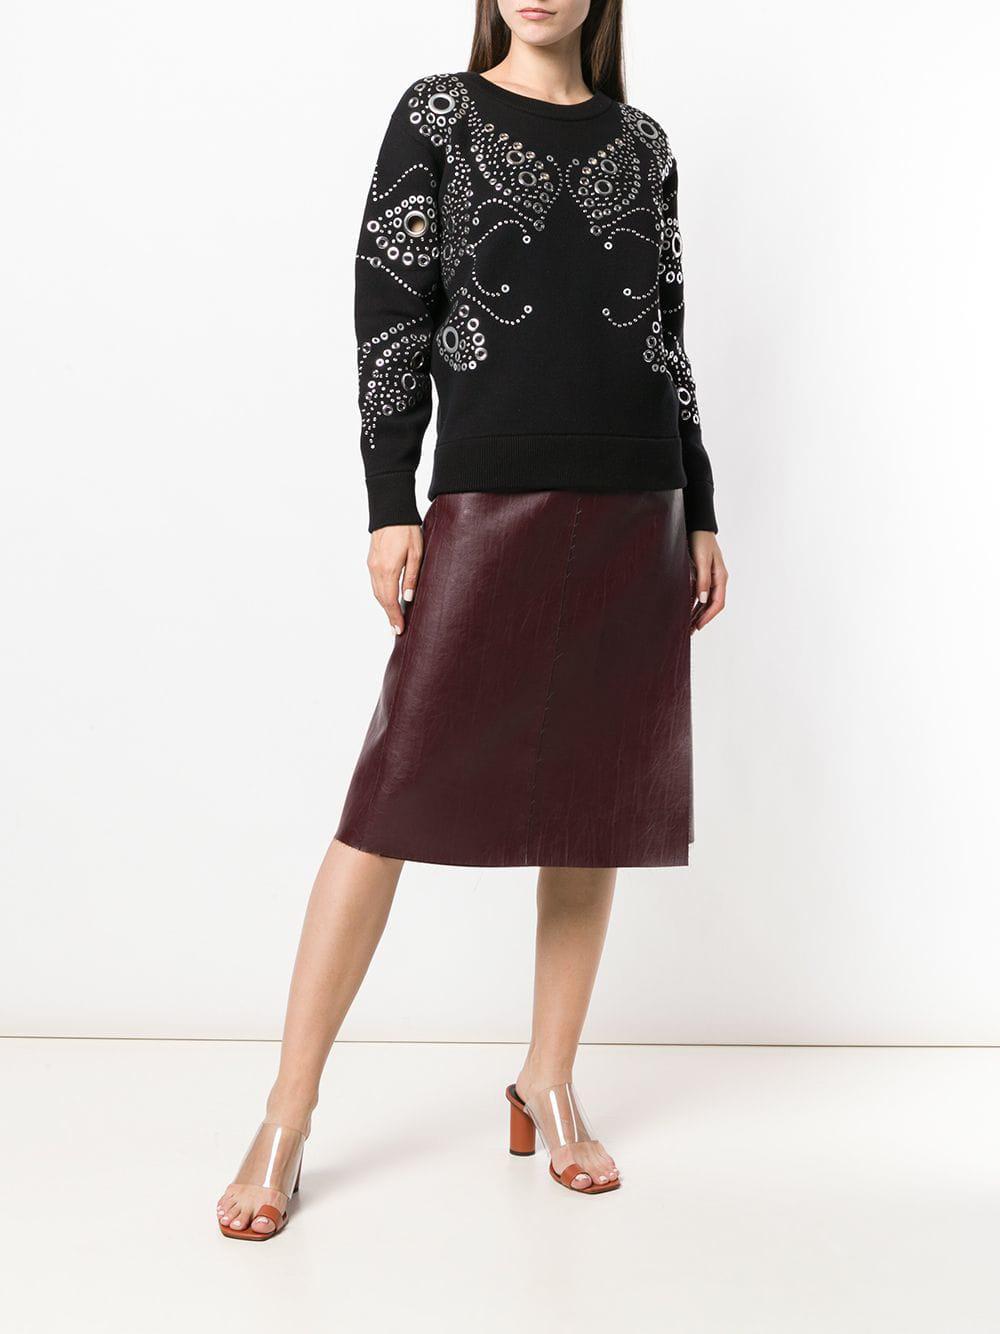 b996db290c9 MICHAEL Michael Kors Studded Detail Sweatshirt in Black - Lyst